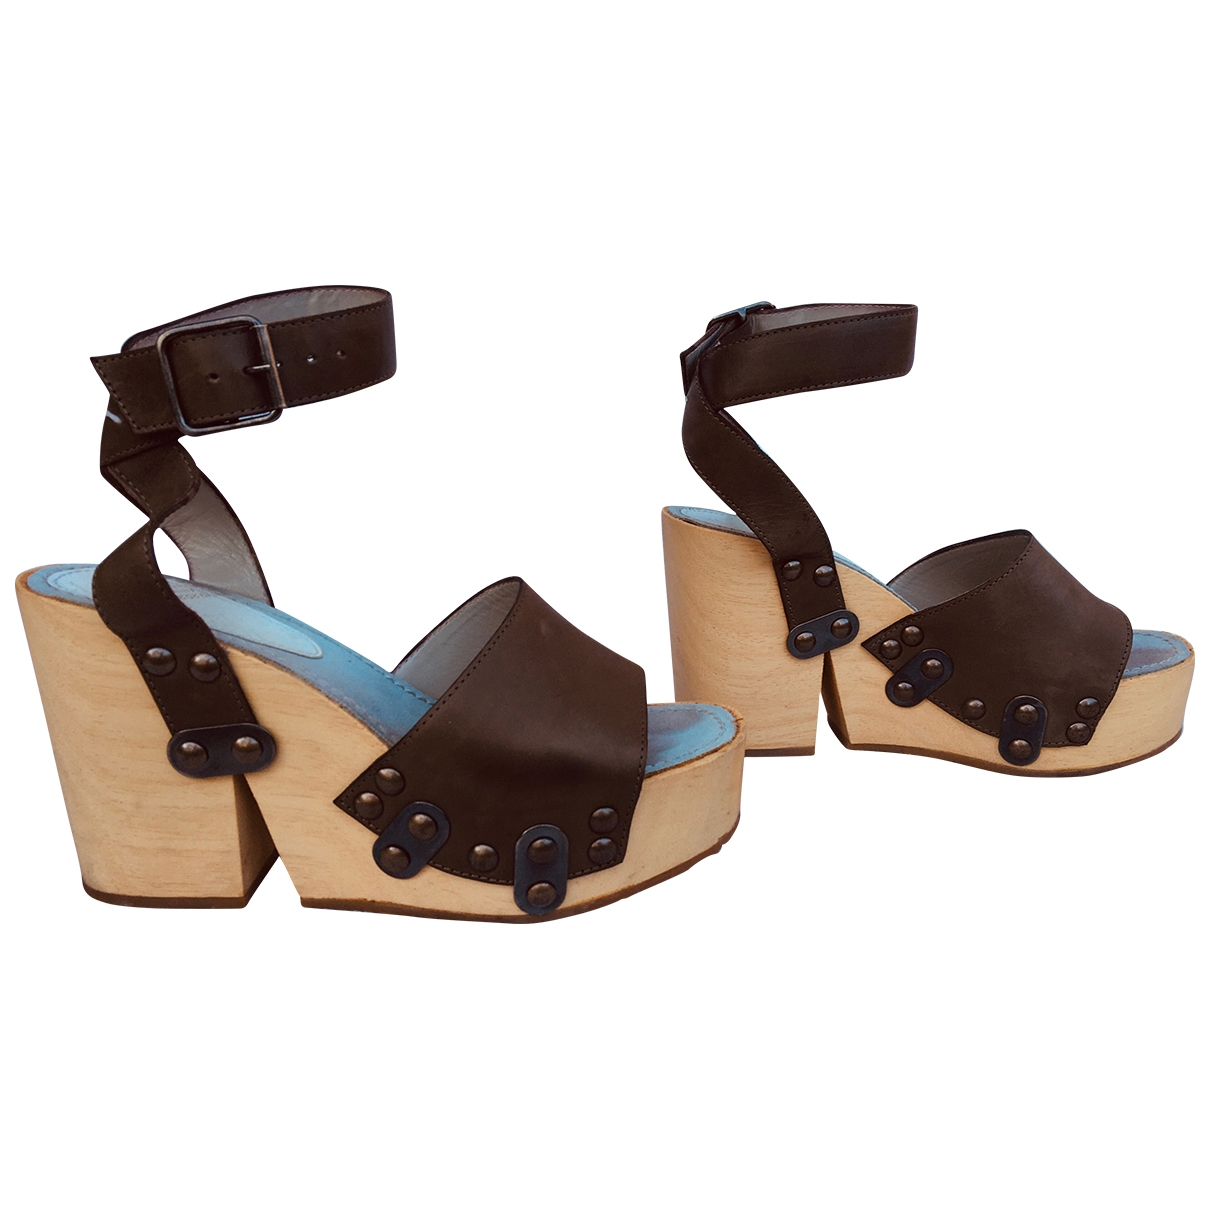 Maison Martin Margiela \N Leather Sandals for Women 36 EU